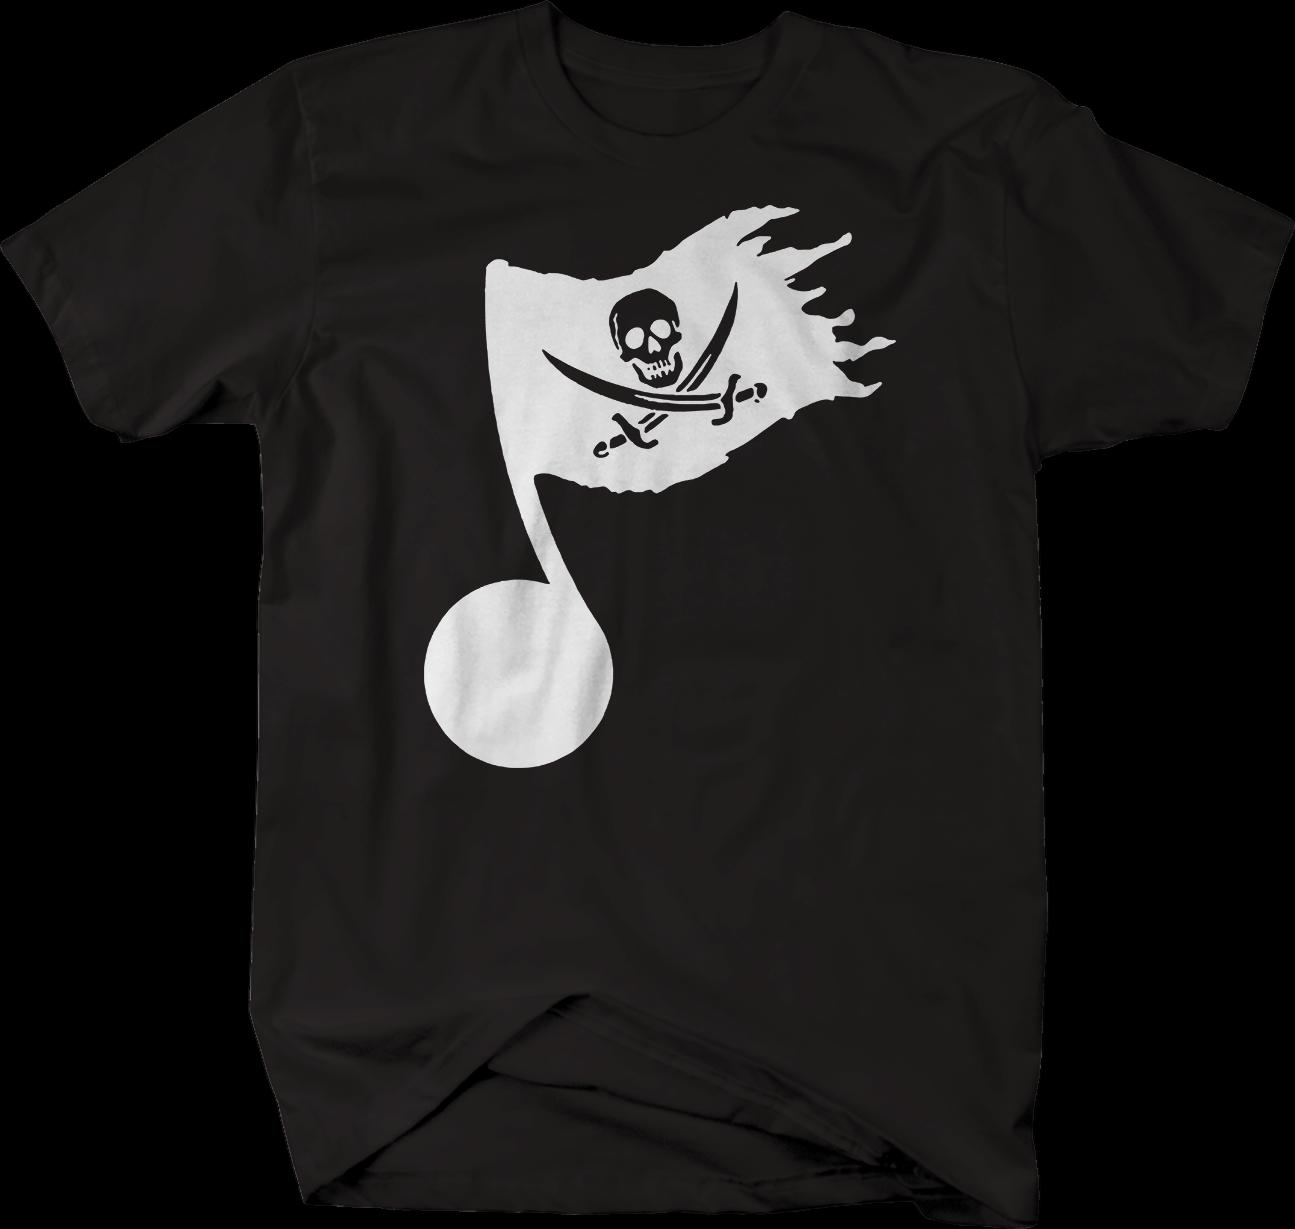 Nota de música bandeira pirata afligido tshirt tendência estilo moda legal masculina